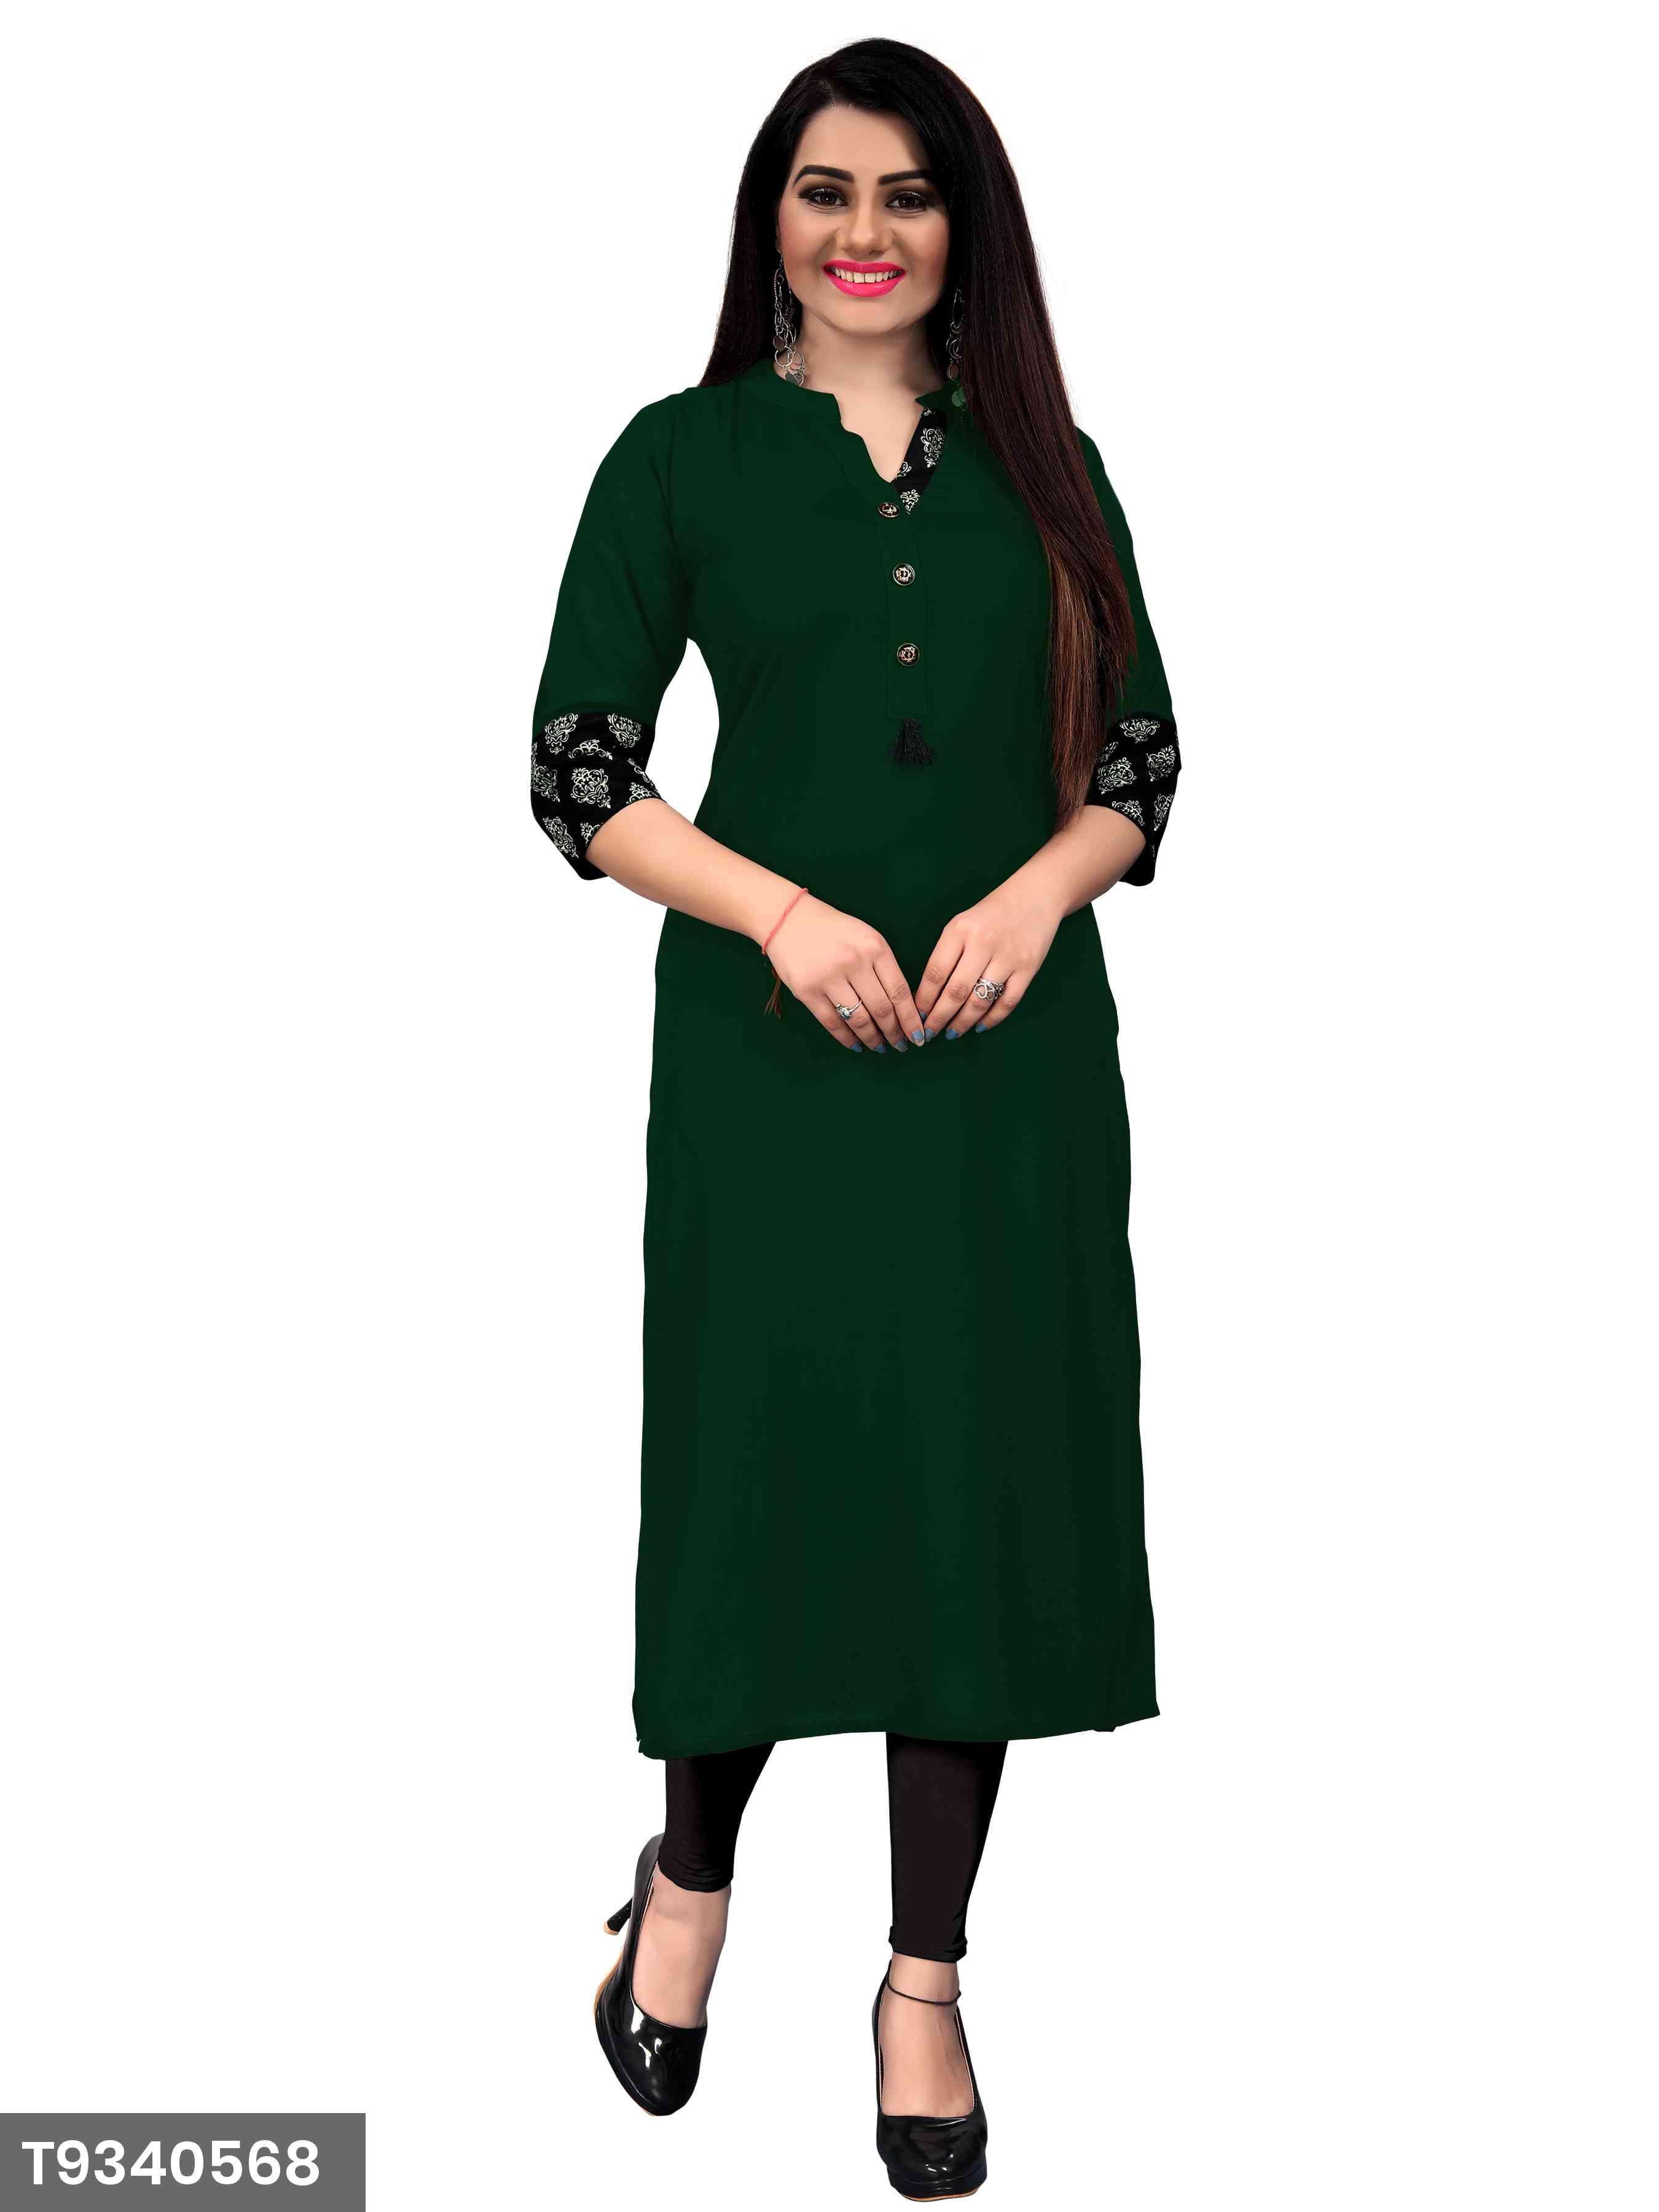 New Plain Dark Green Color Rayon Kurti For Women's